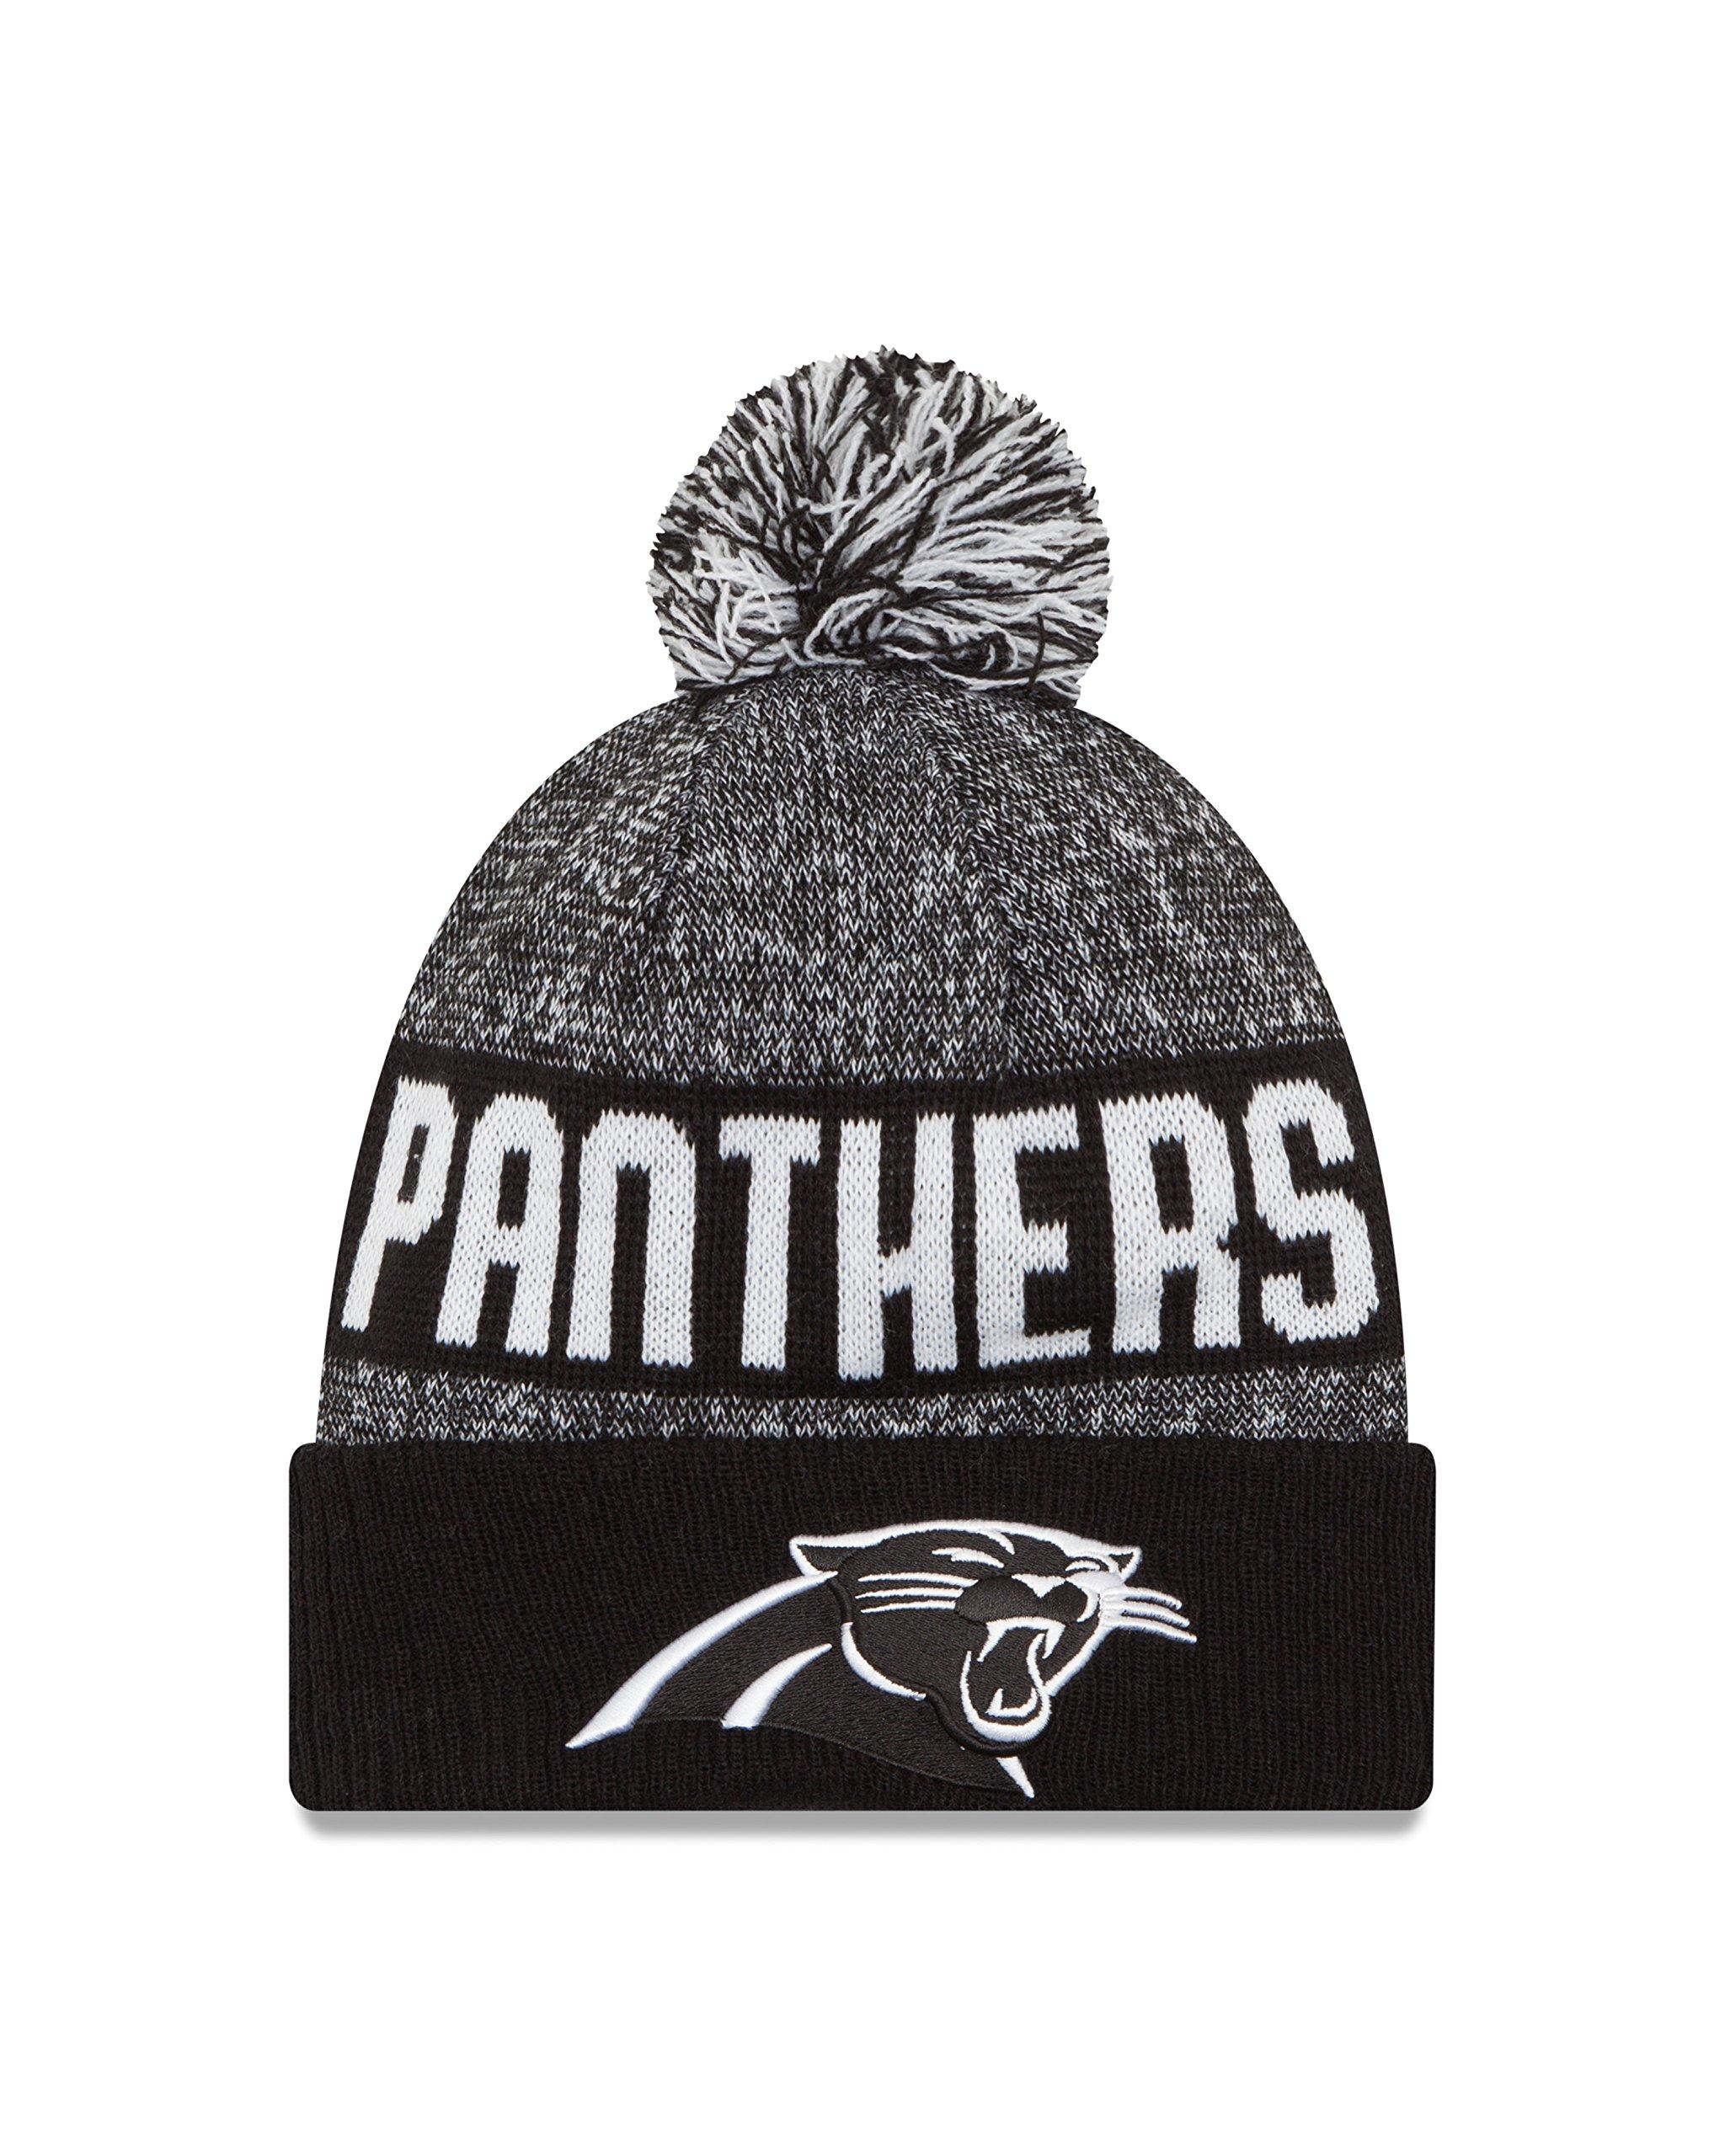 New Era NFL Carolina Panthers 2016 Sport Knit Beanie, One Size, Black/White